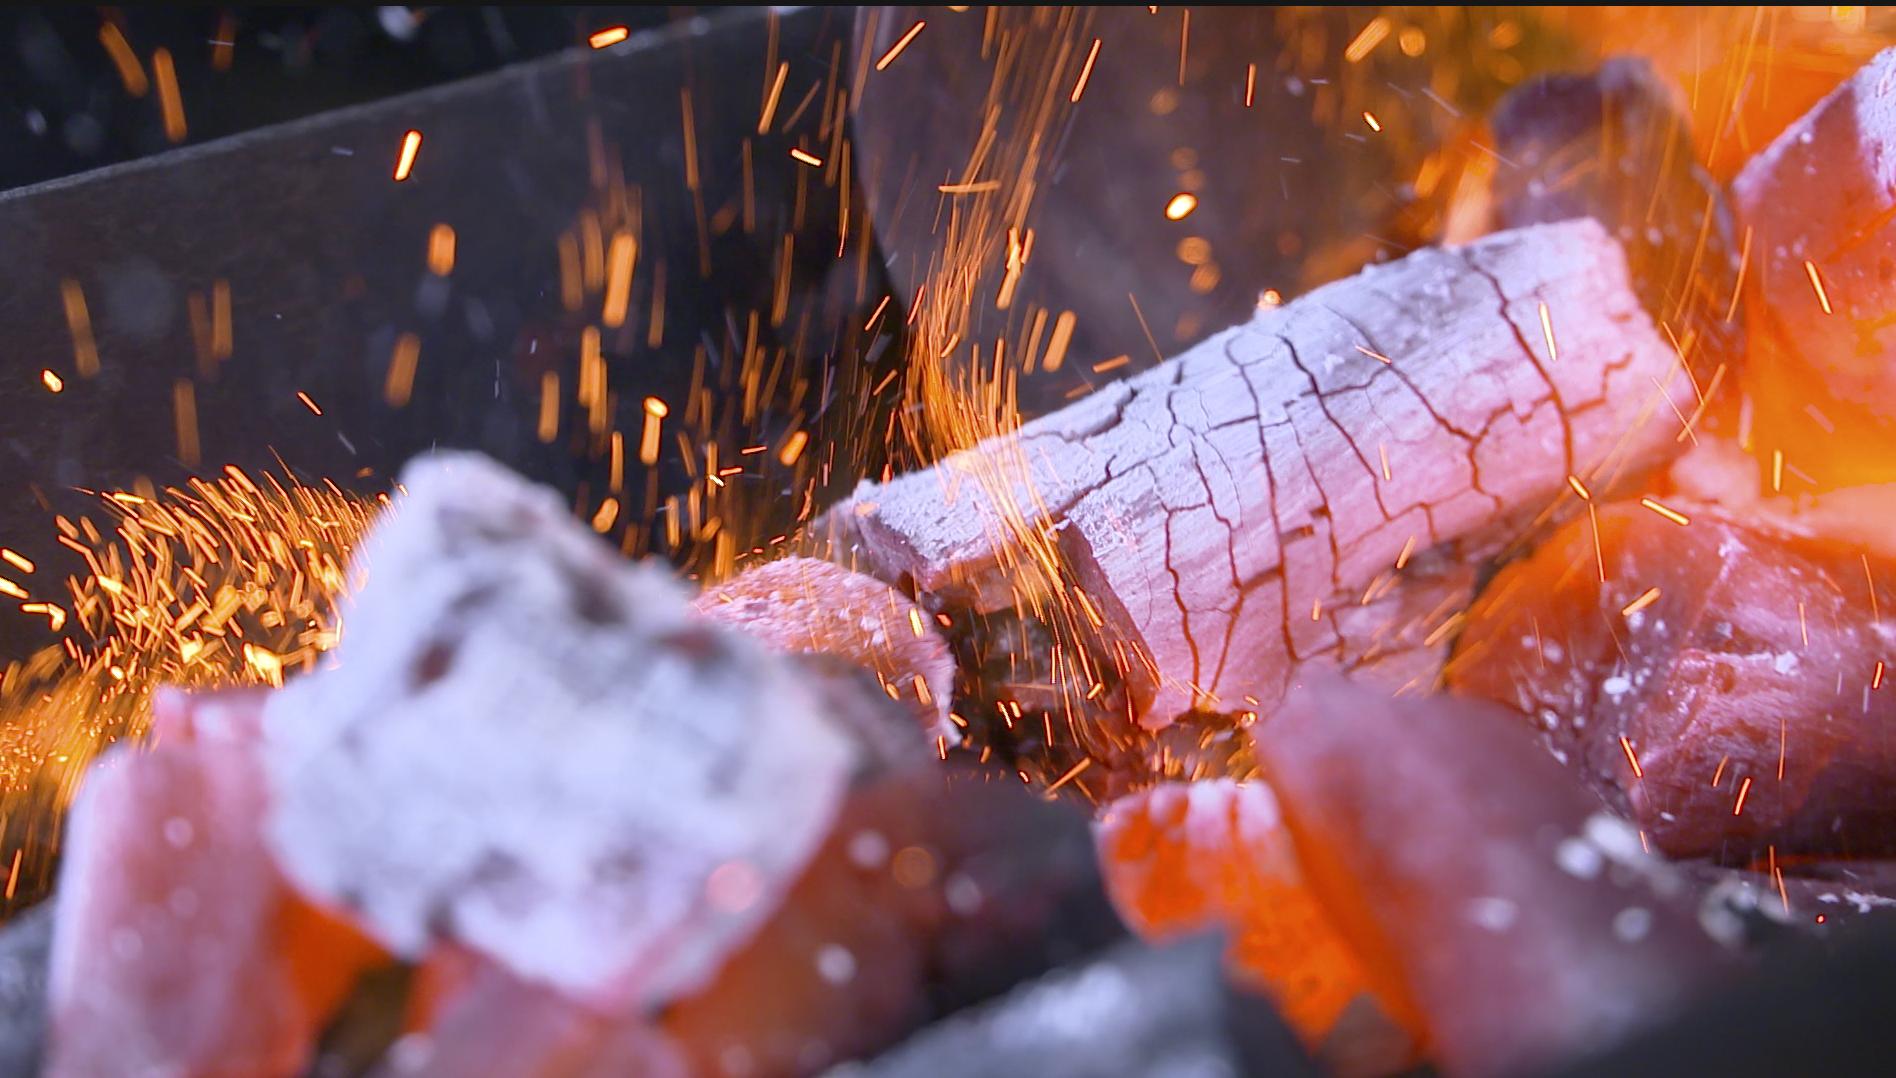 Boretti @ Bocadero - Mei 2018Vanaf 18 mei opent ons pop-up grill restaurant op Zomer Bocadero. In samenwerking met Boretti laten we je hier de zomer proeven!Reserveer nu